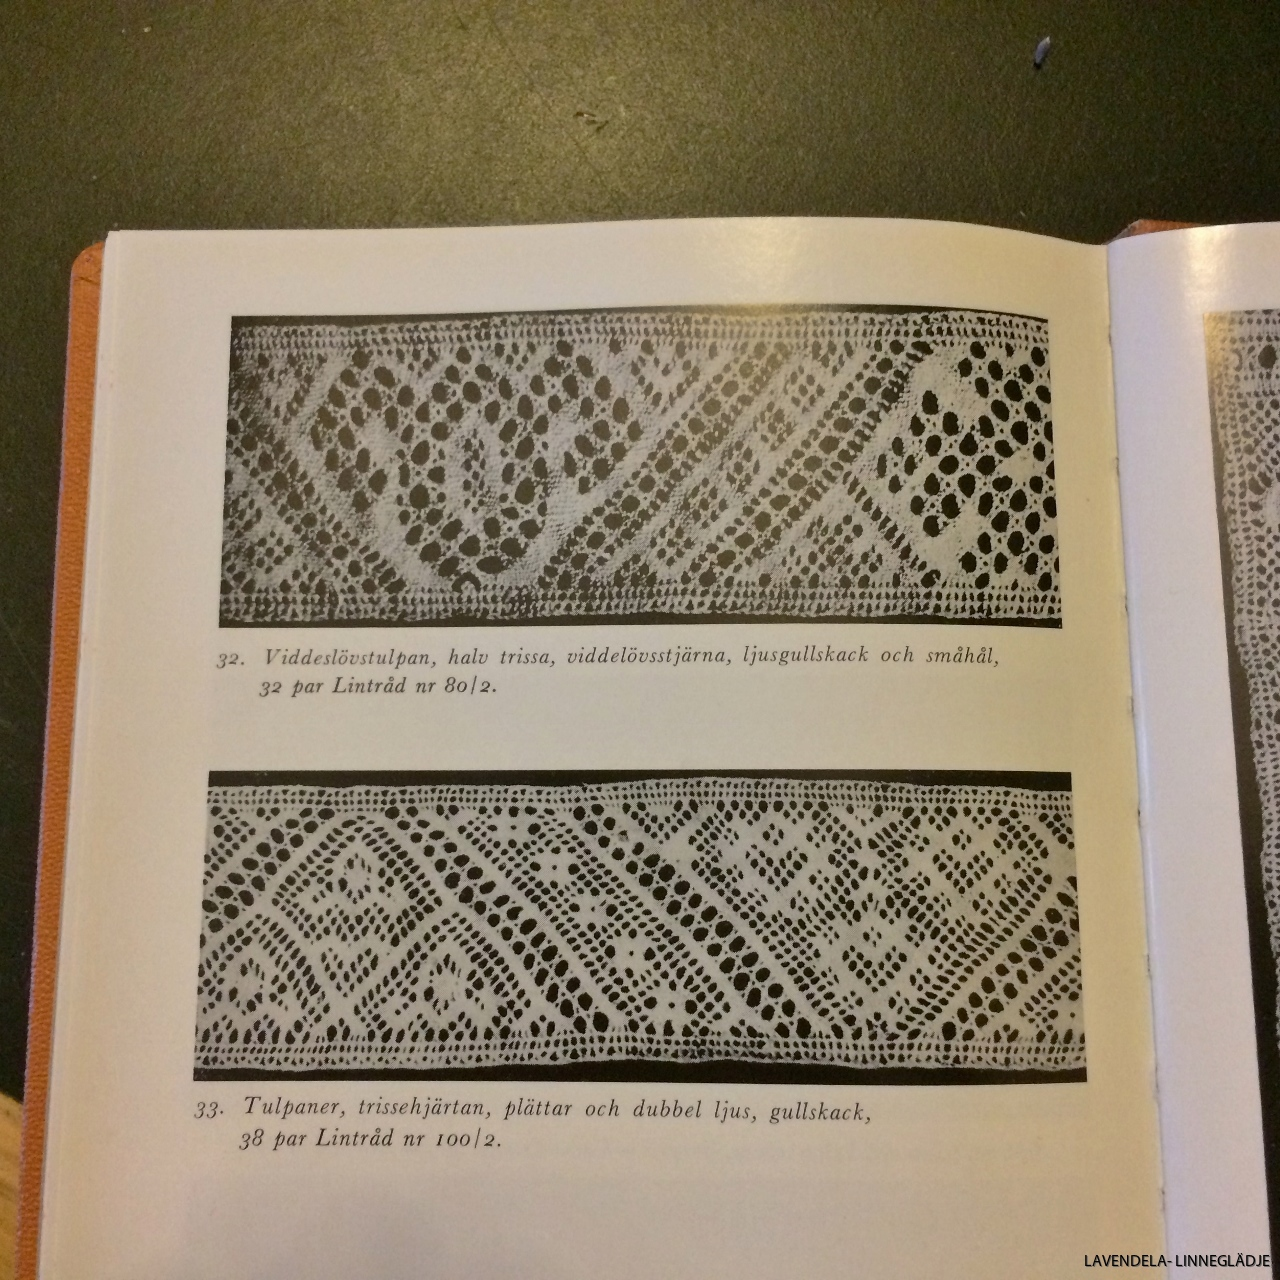 Intressant bok om Skånsk knyppling.